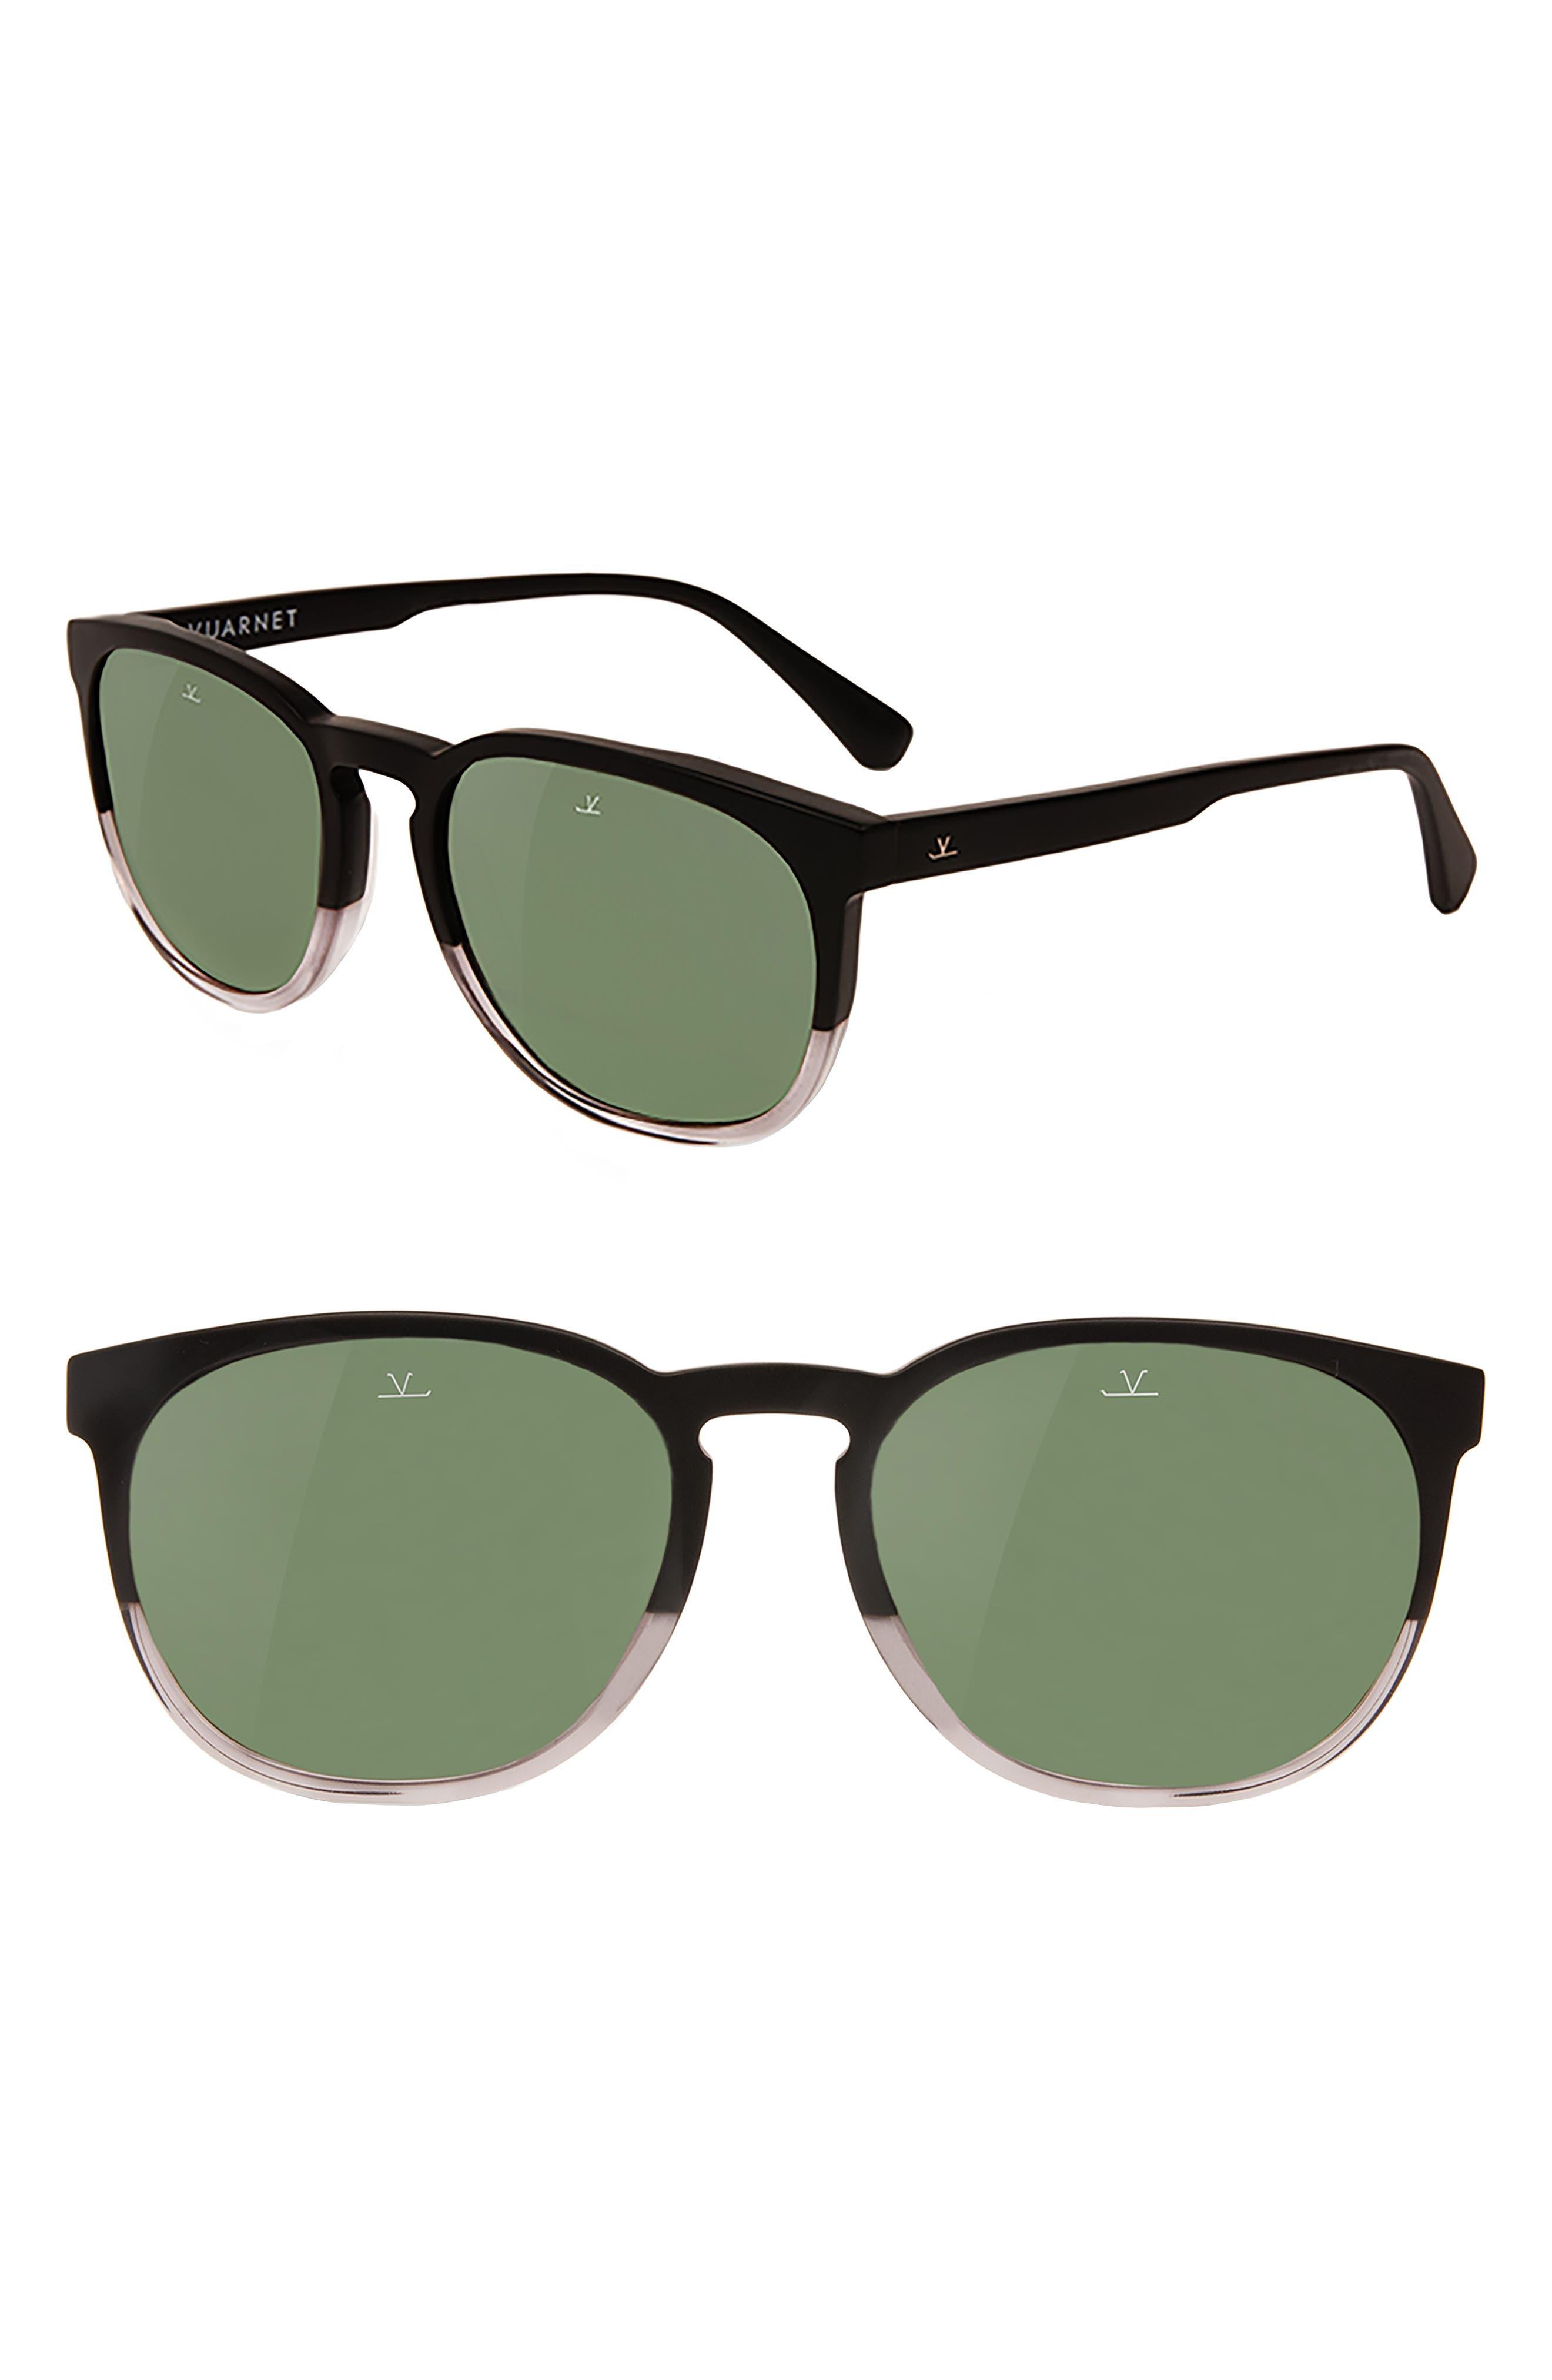 District 54mm Sunglasses,                         Main,                         color, MATT BLACK / SHINY TRANSPARENT